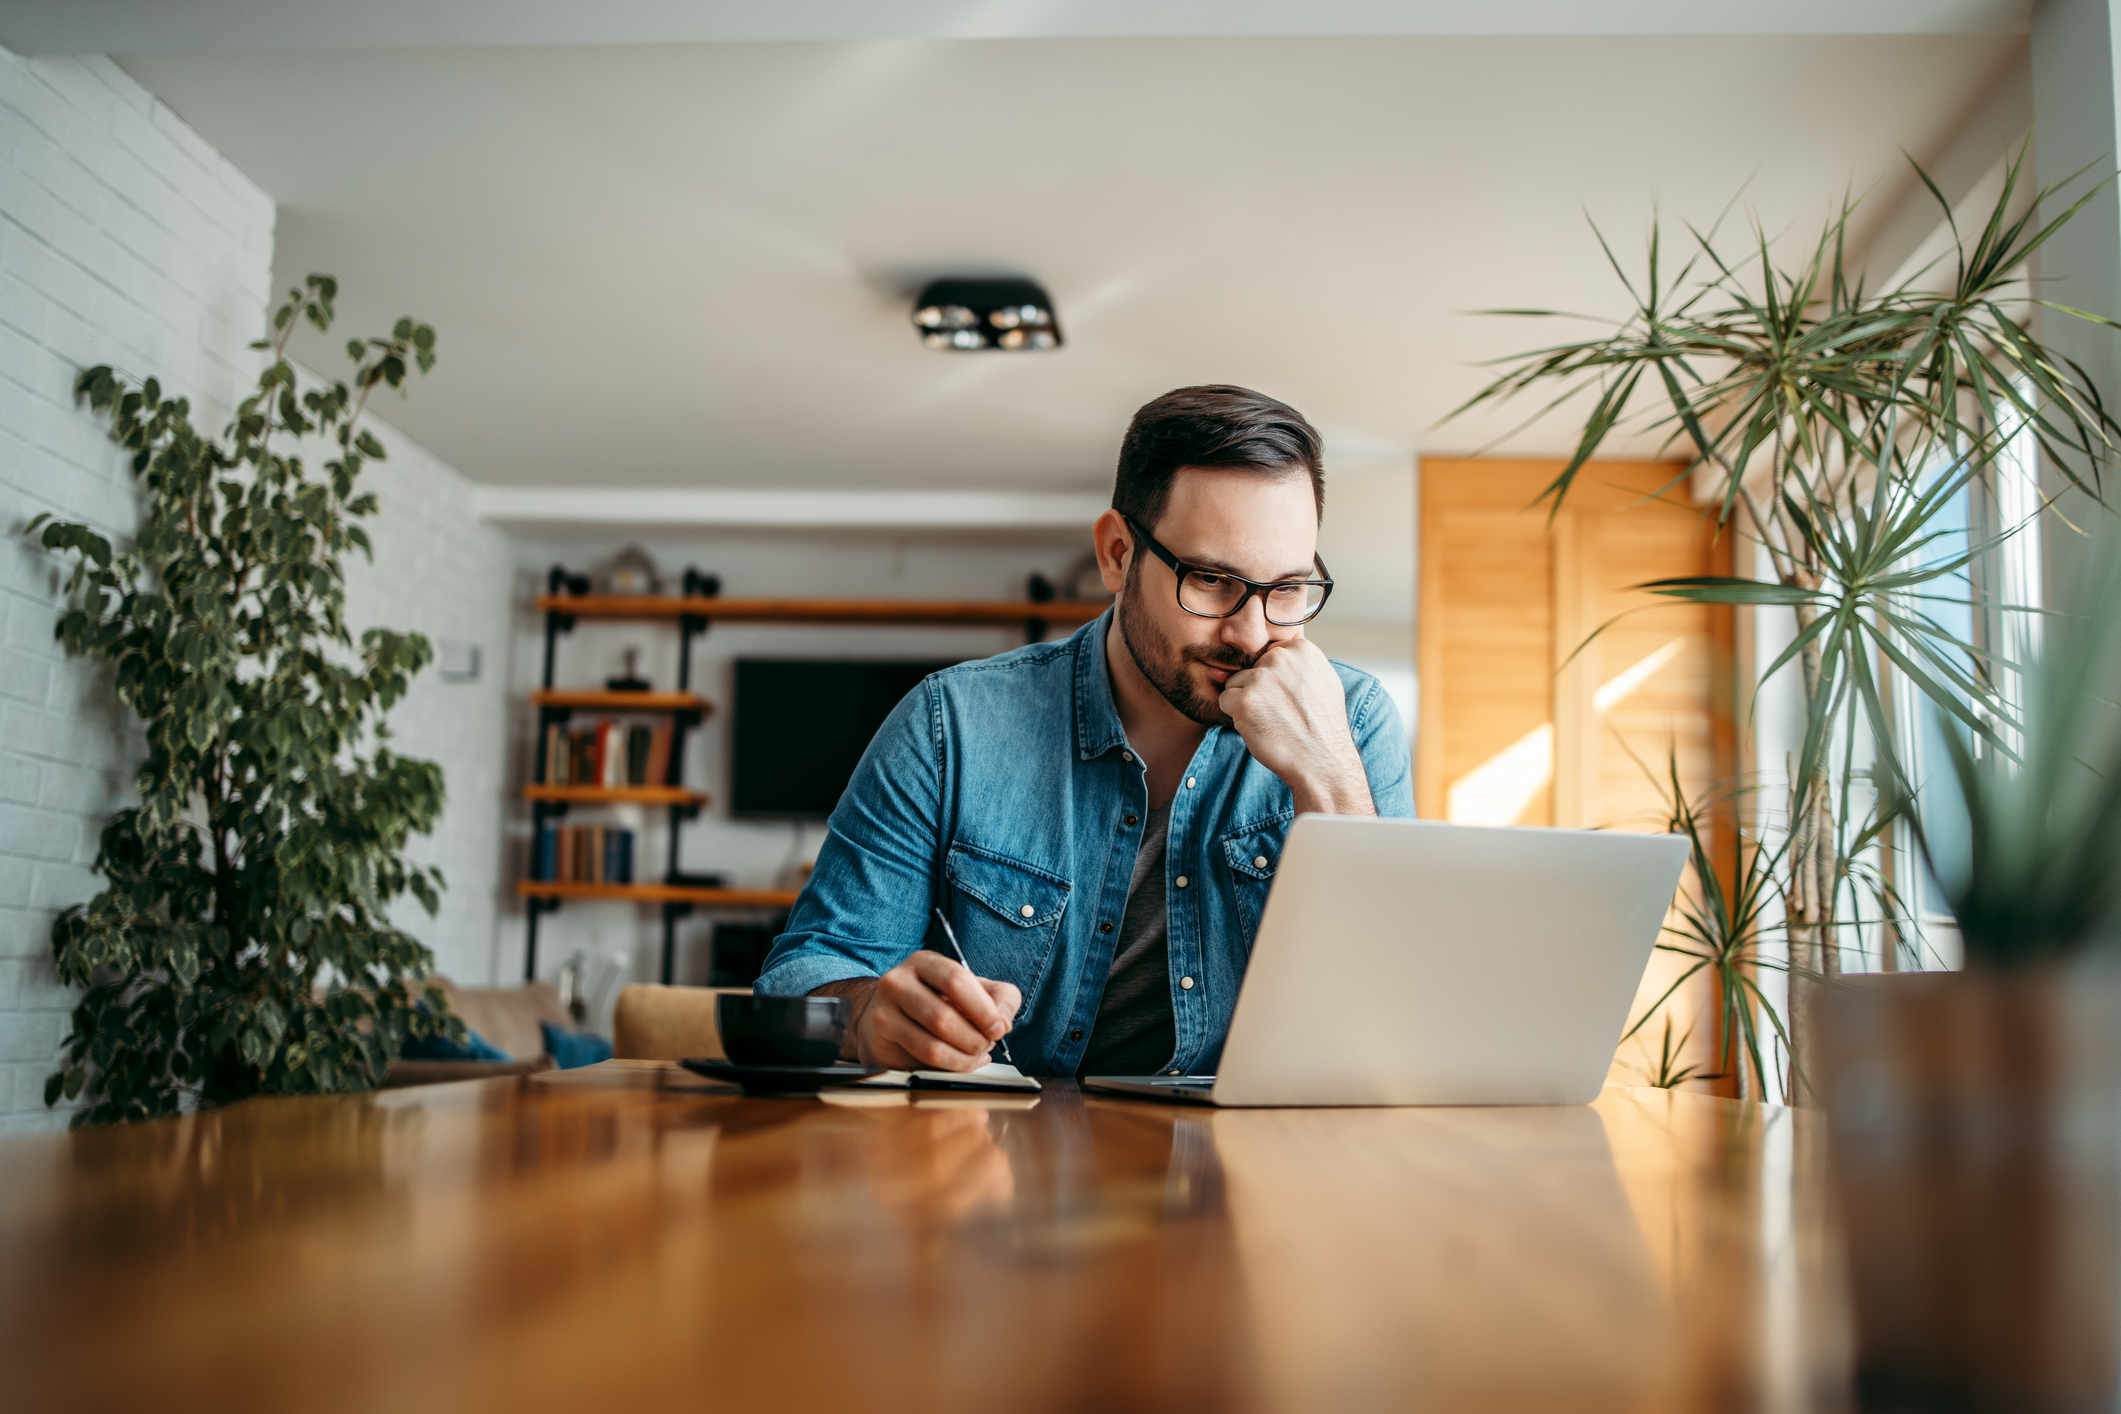 Man looking at computer and taking notes